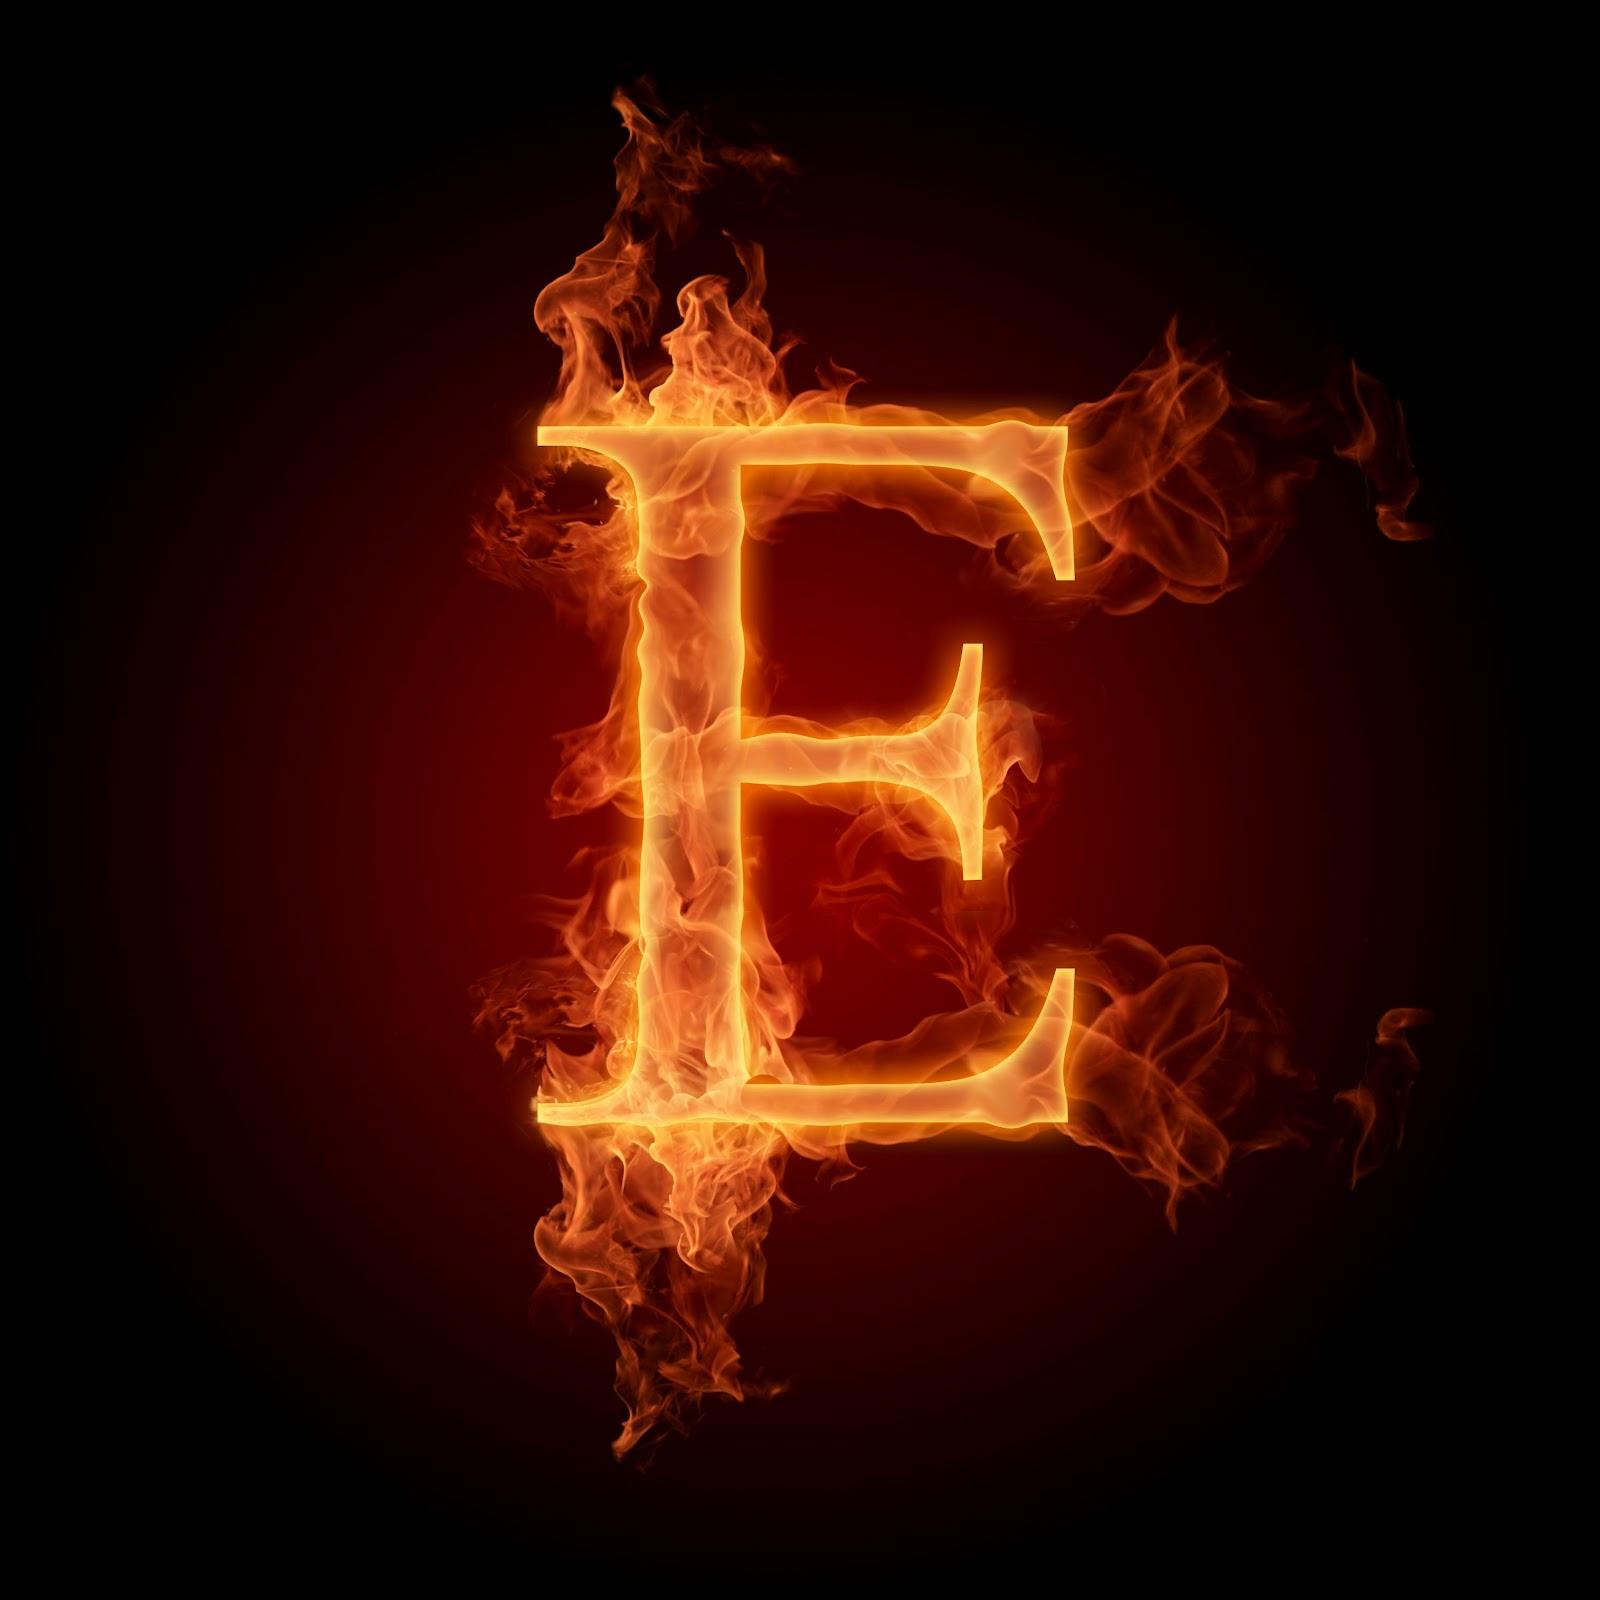 E Wallpaper